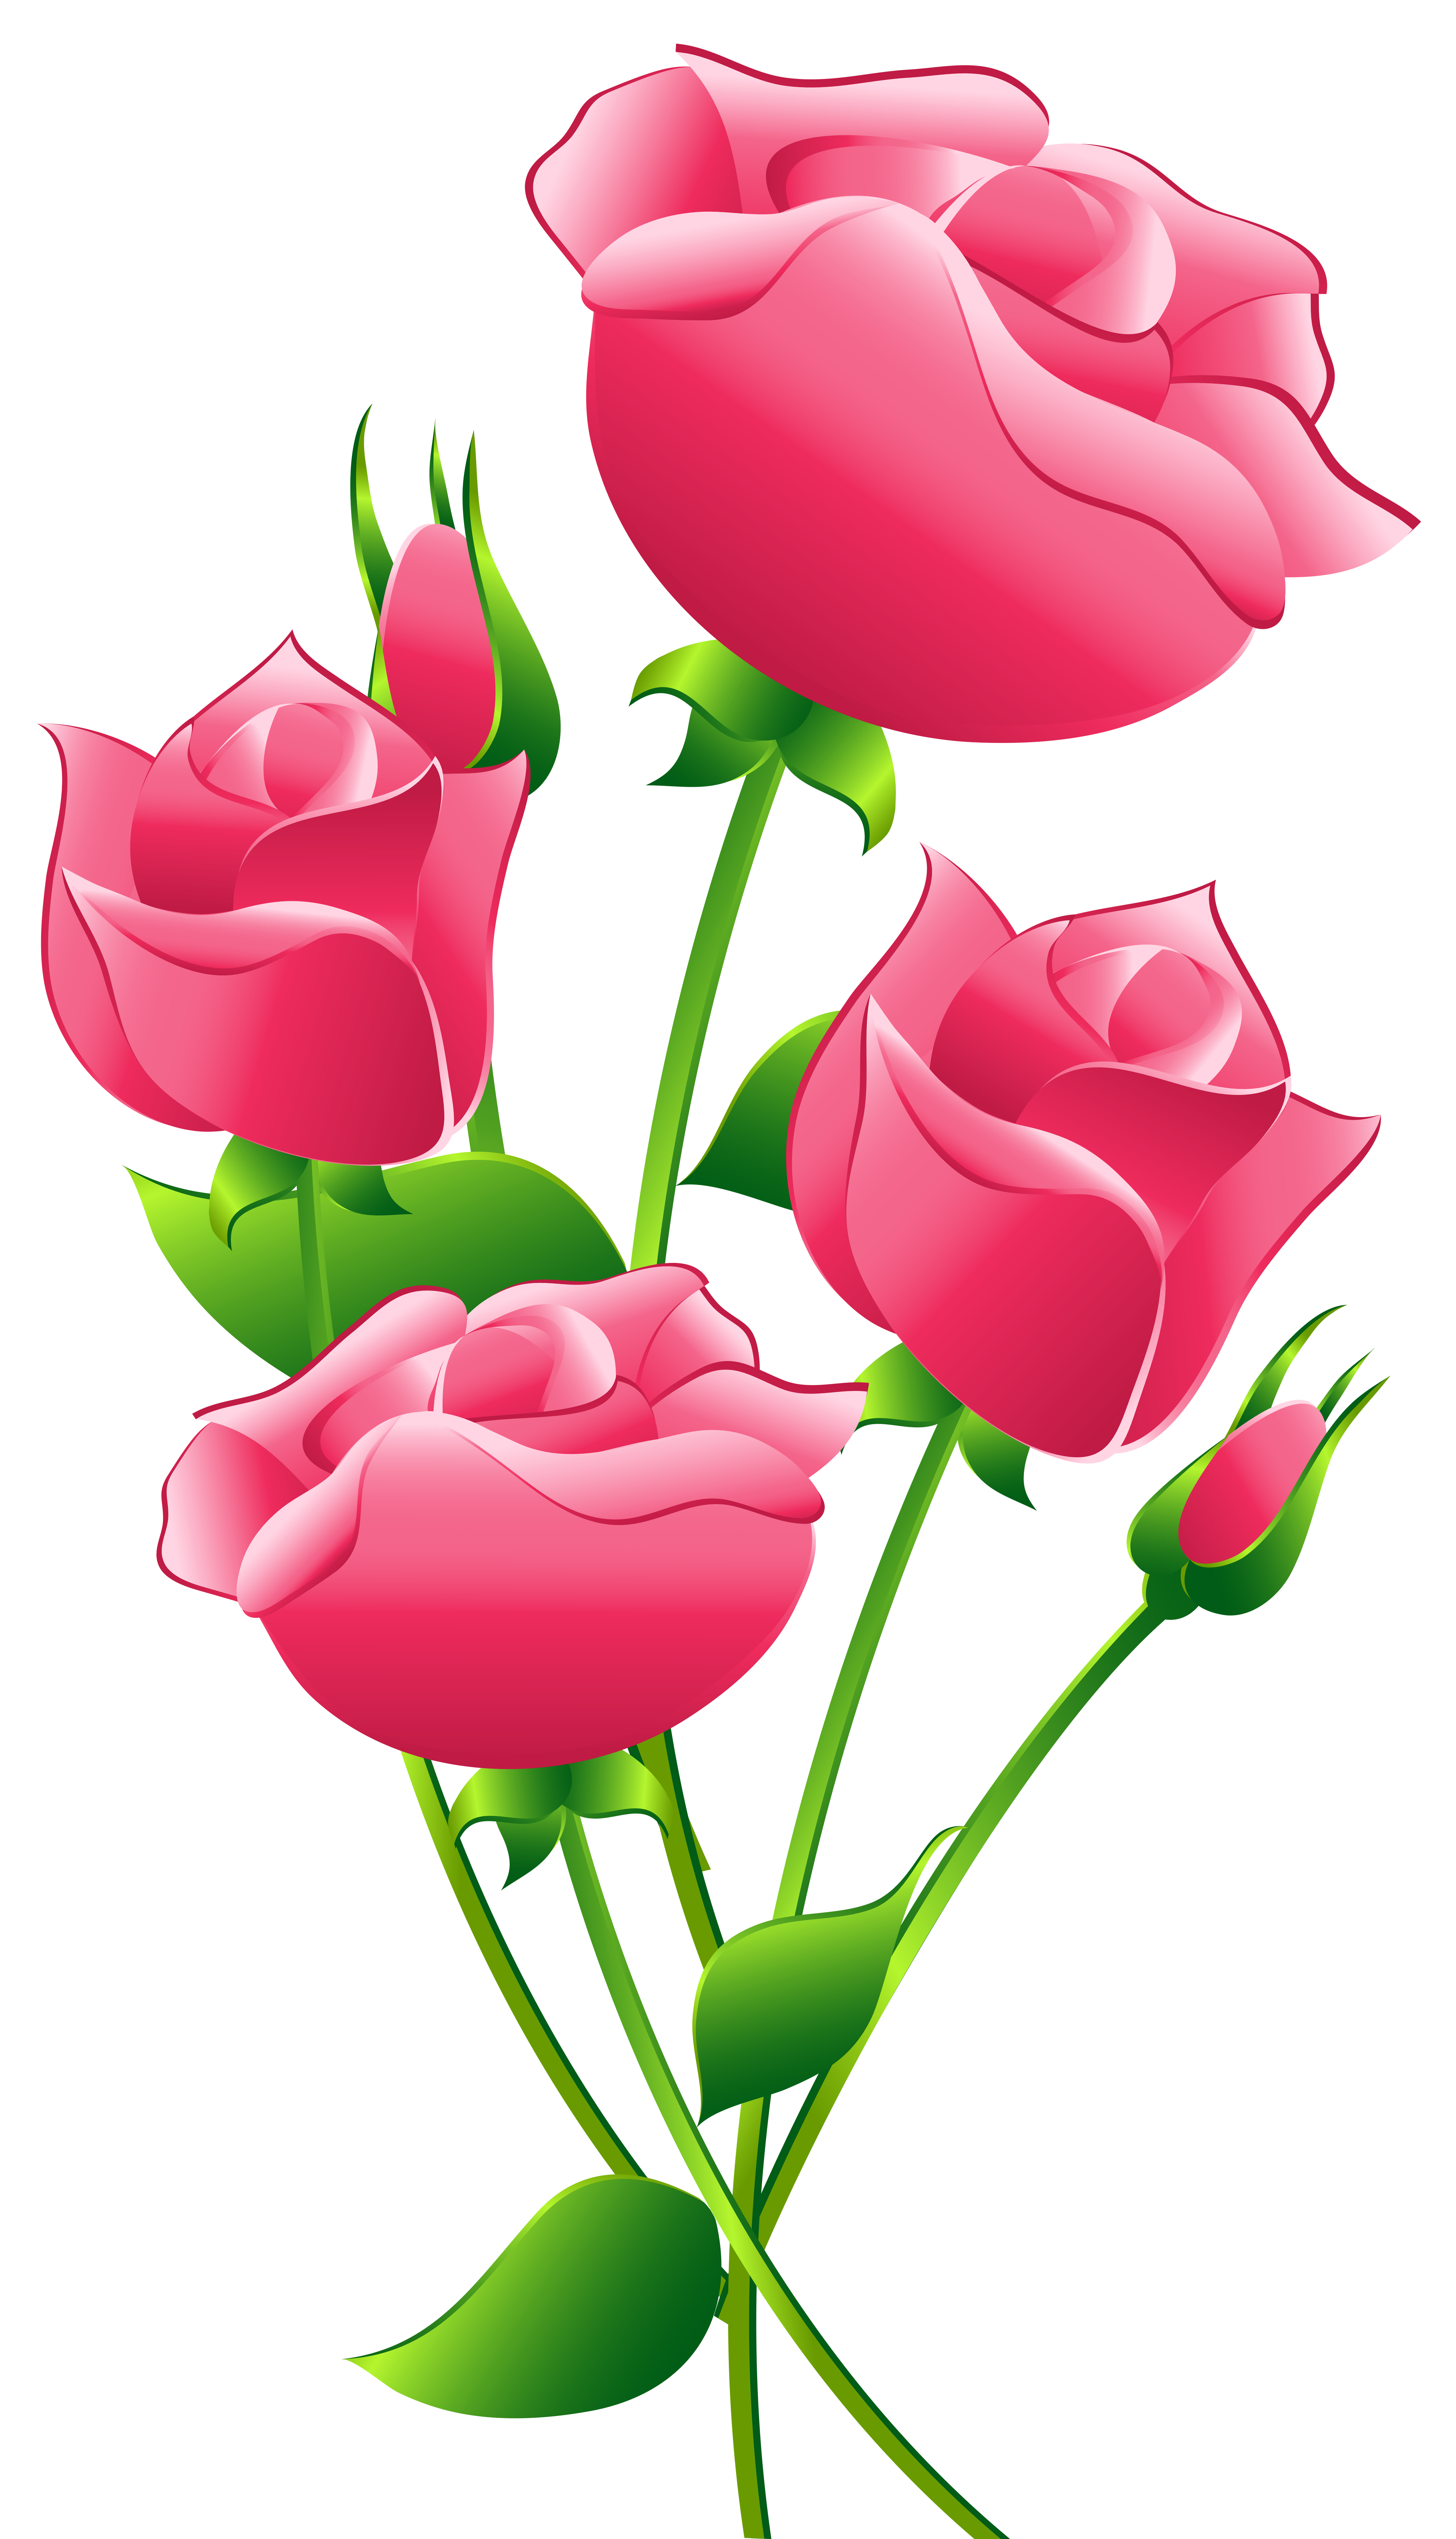 Rose clipart pink rose #8